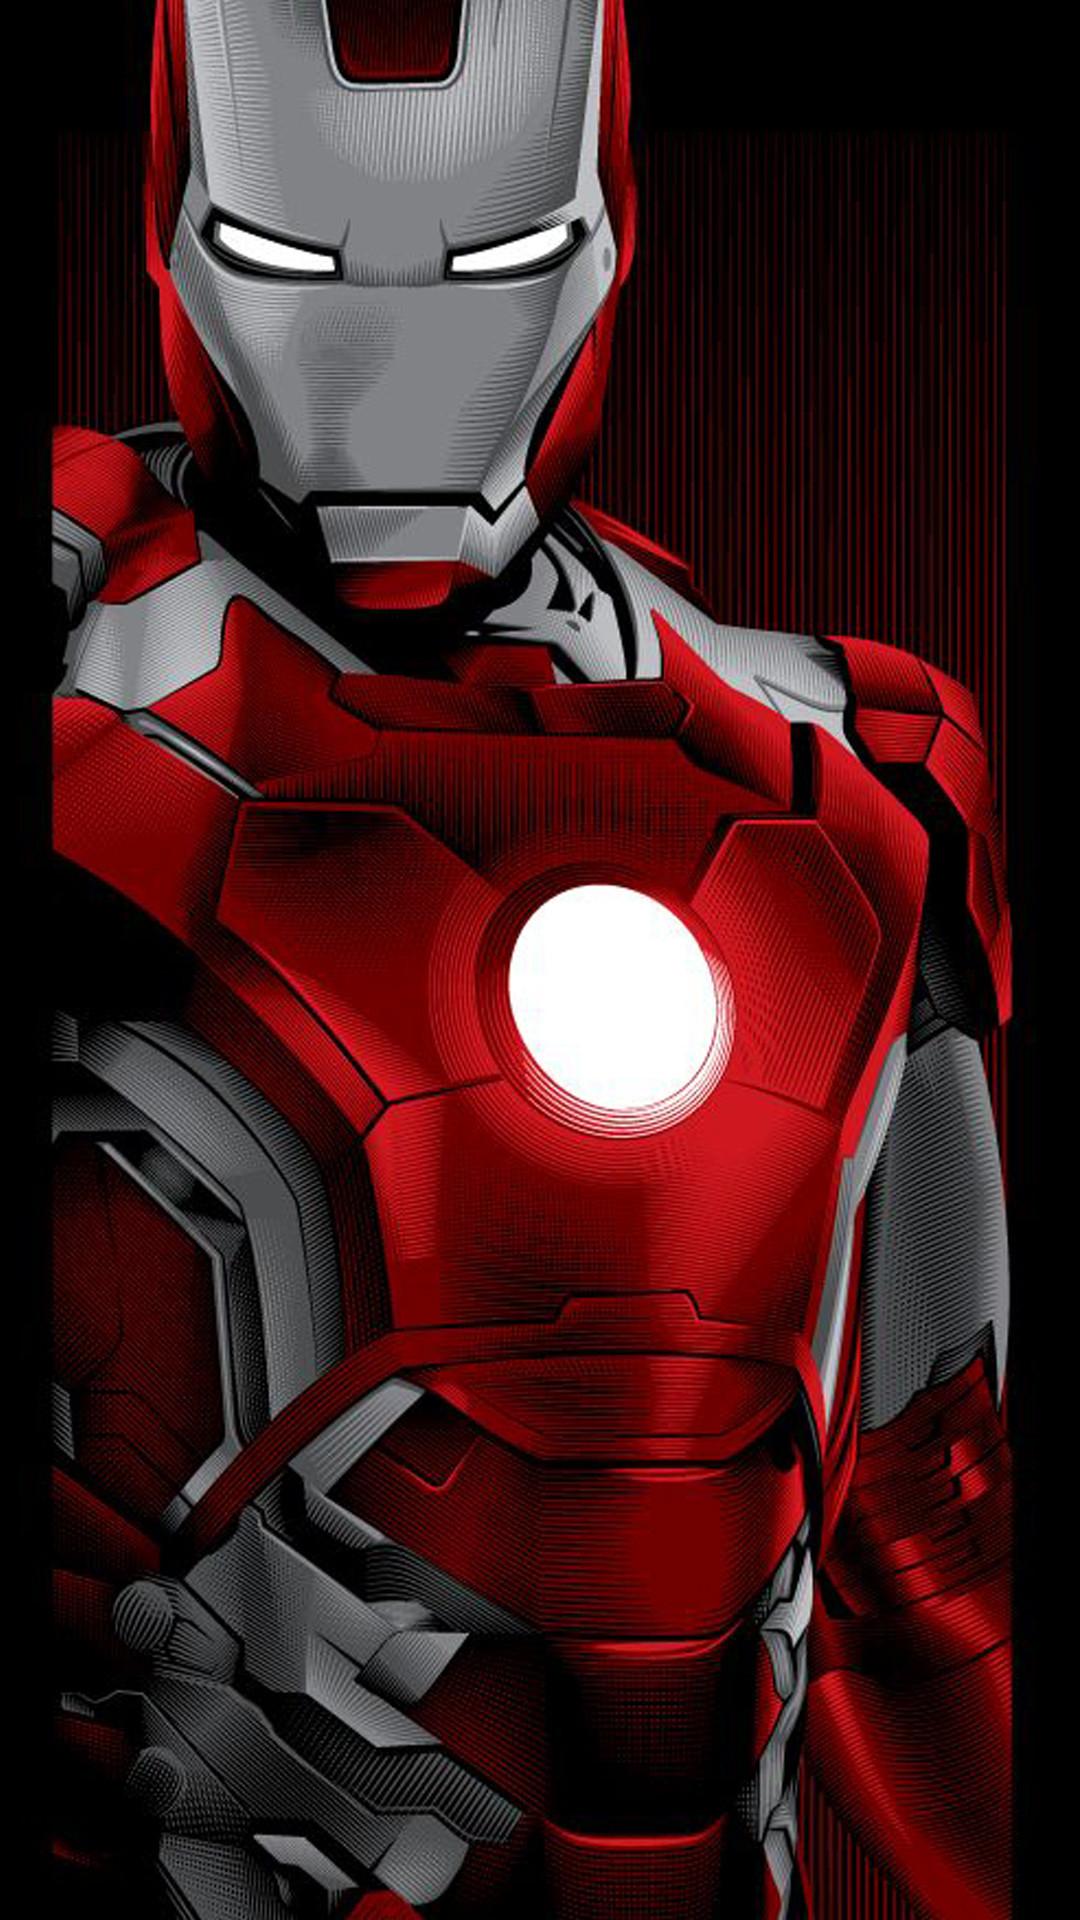 Arc reactor wallpaper hd 75 images - Iron man cartoon hd ...